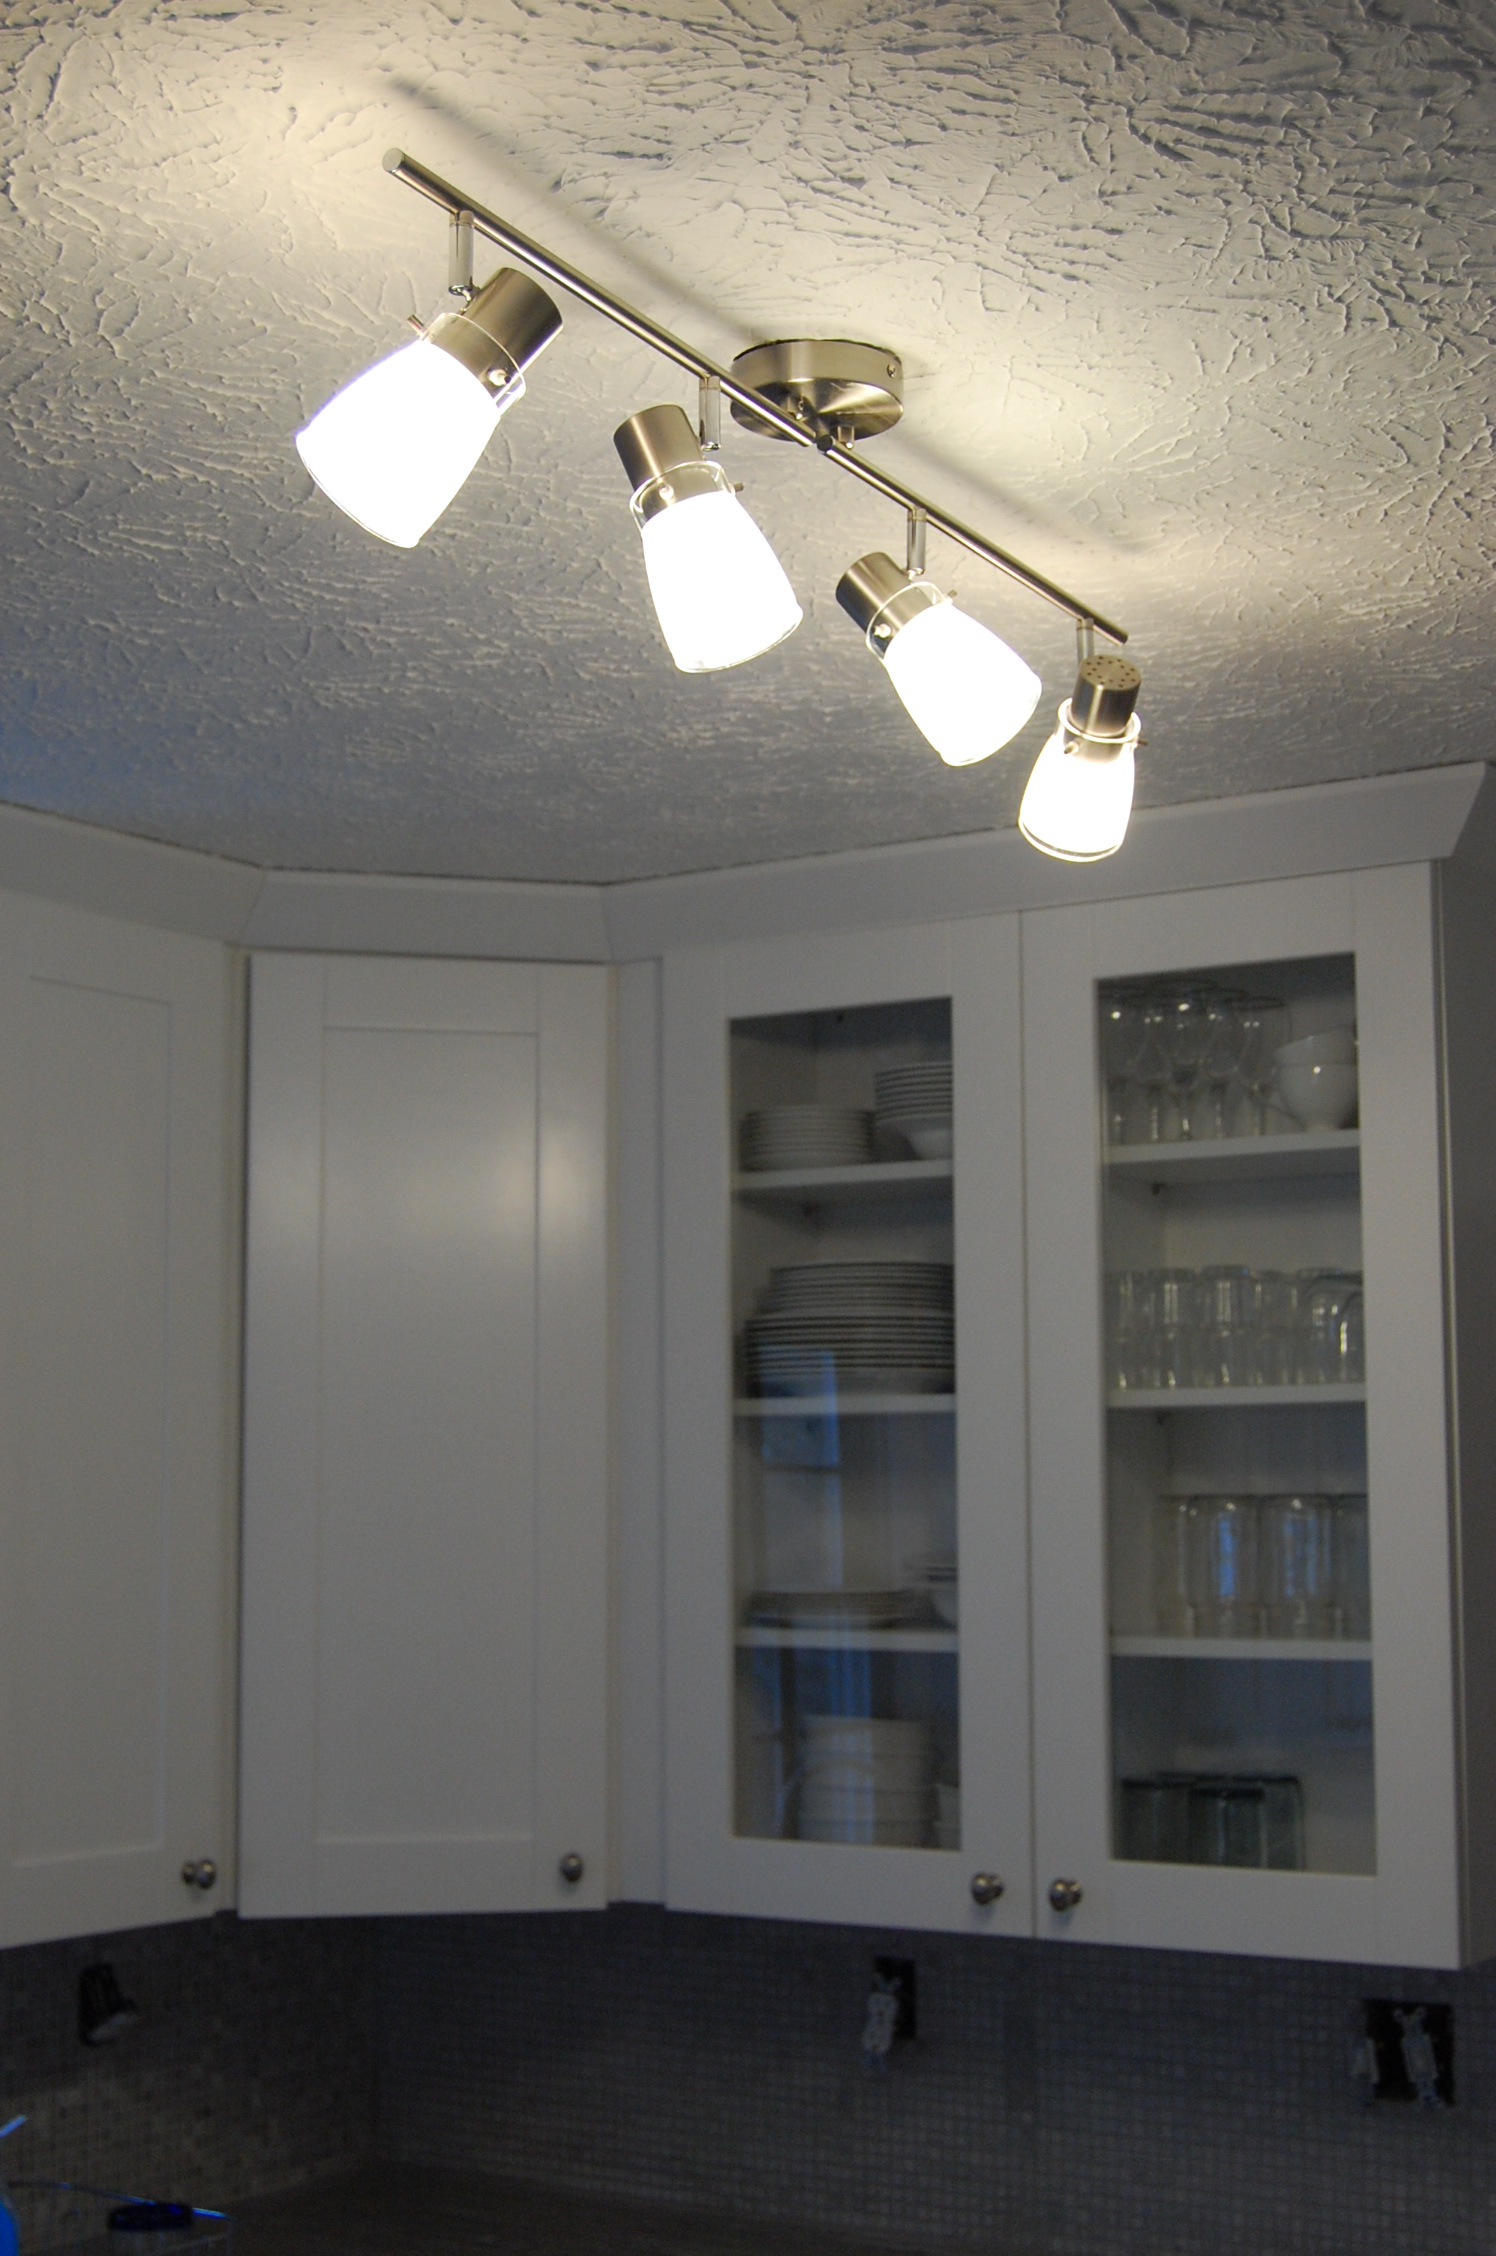 lights camera overstock overhead kitchen lighting Lately